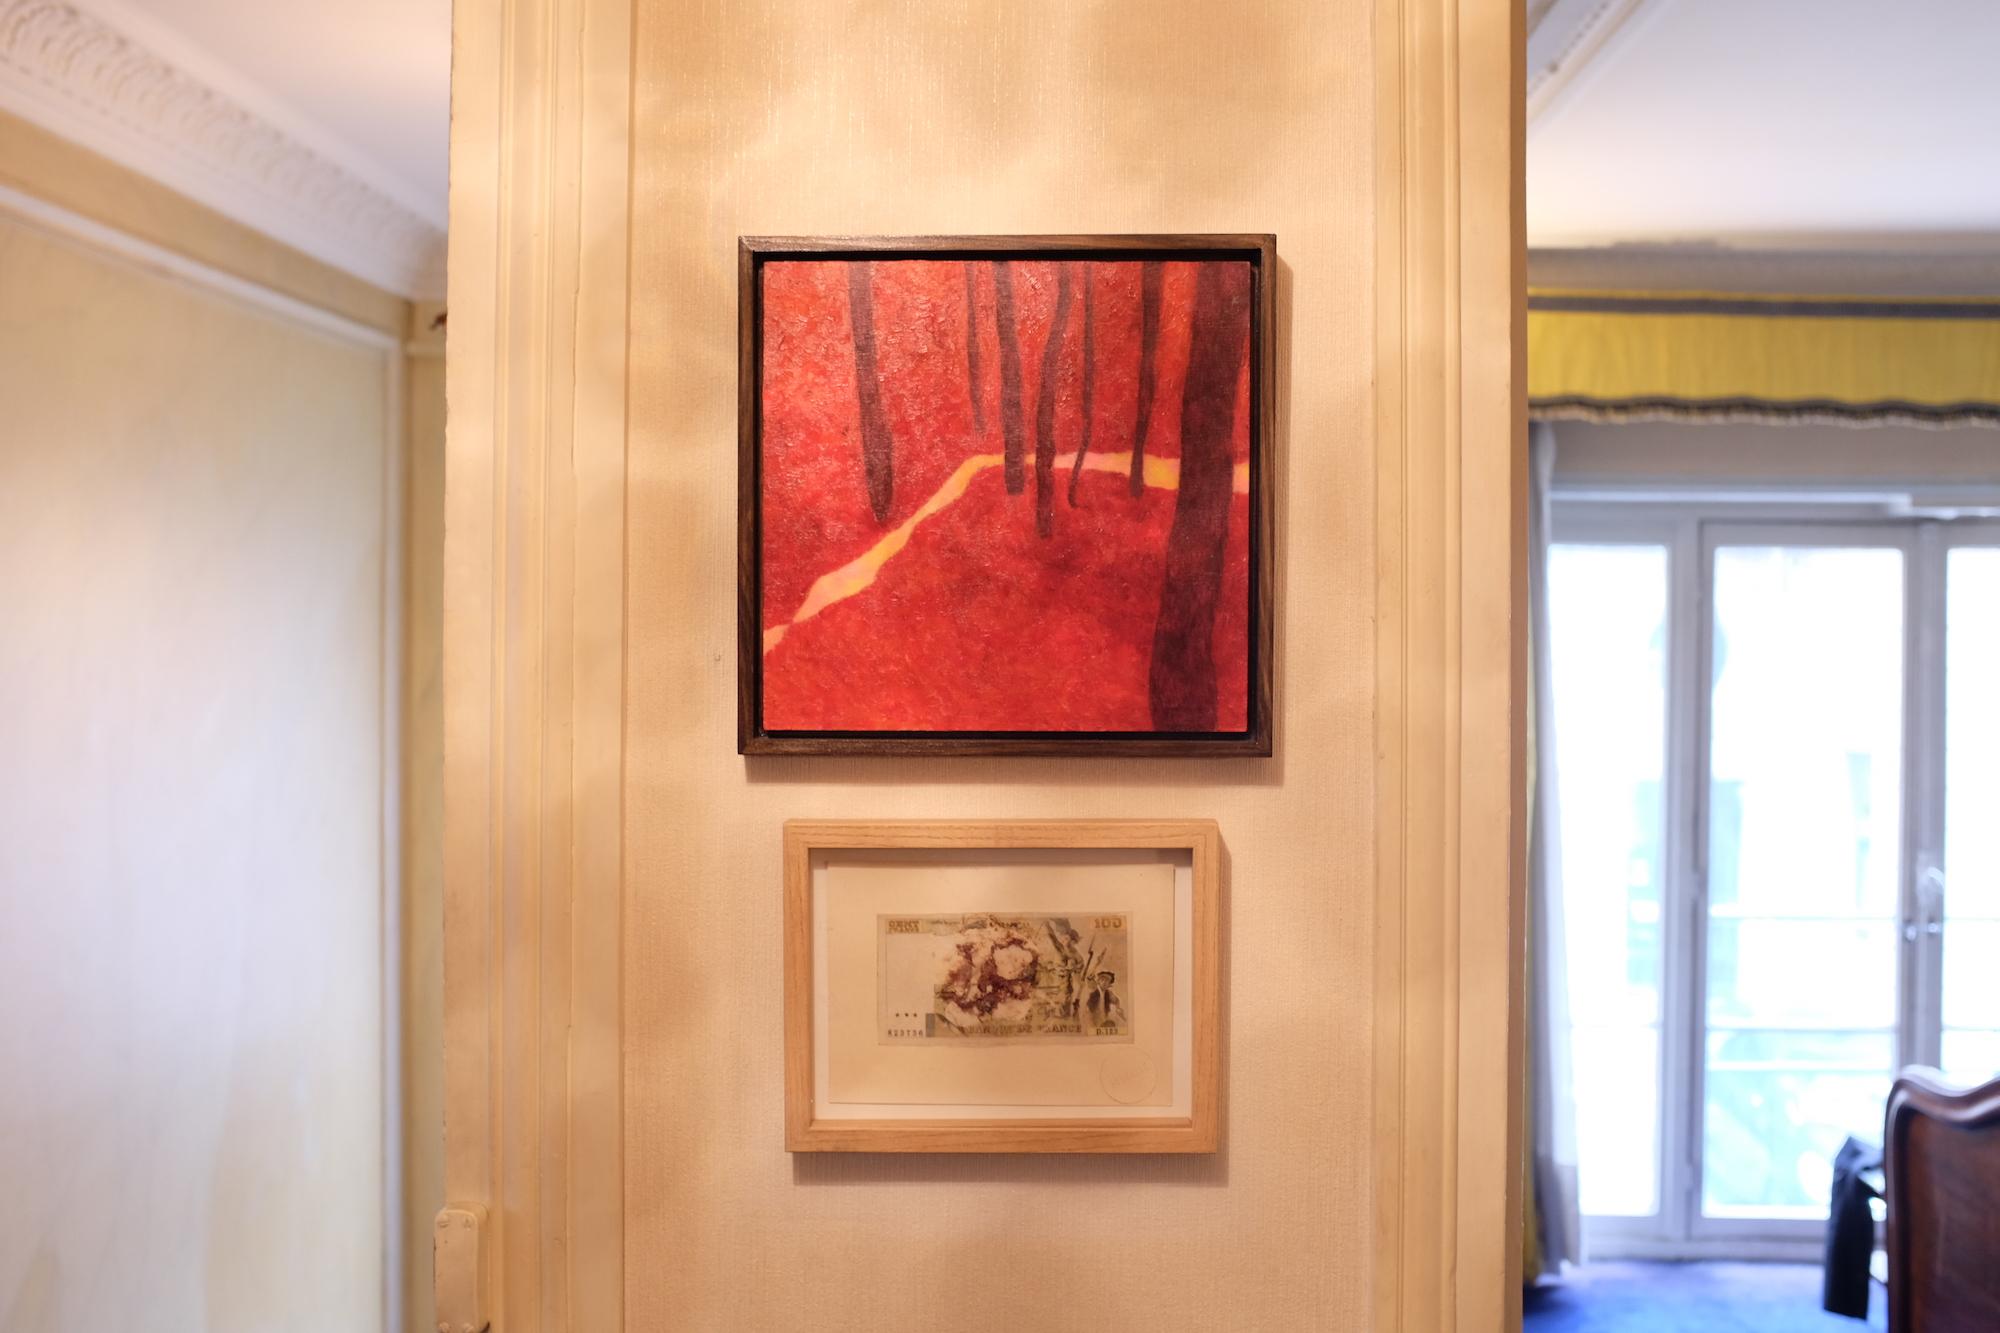 paul mouginot_L Anti Destin_exhibition_C-21